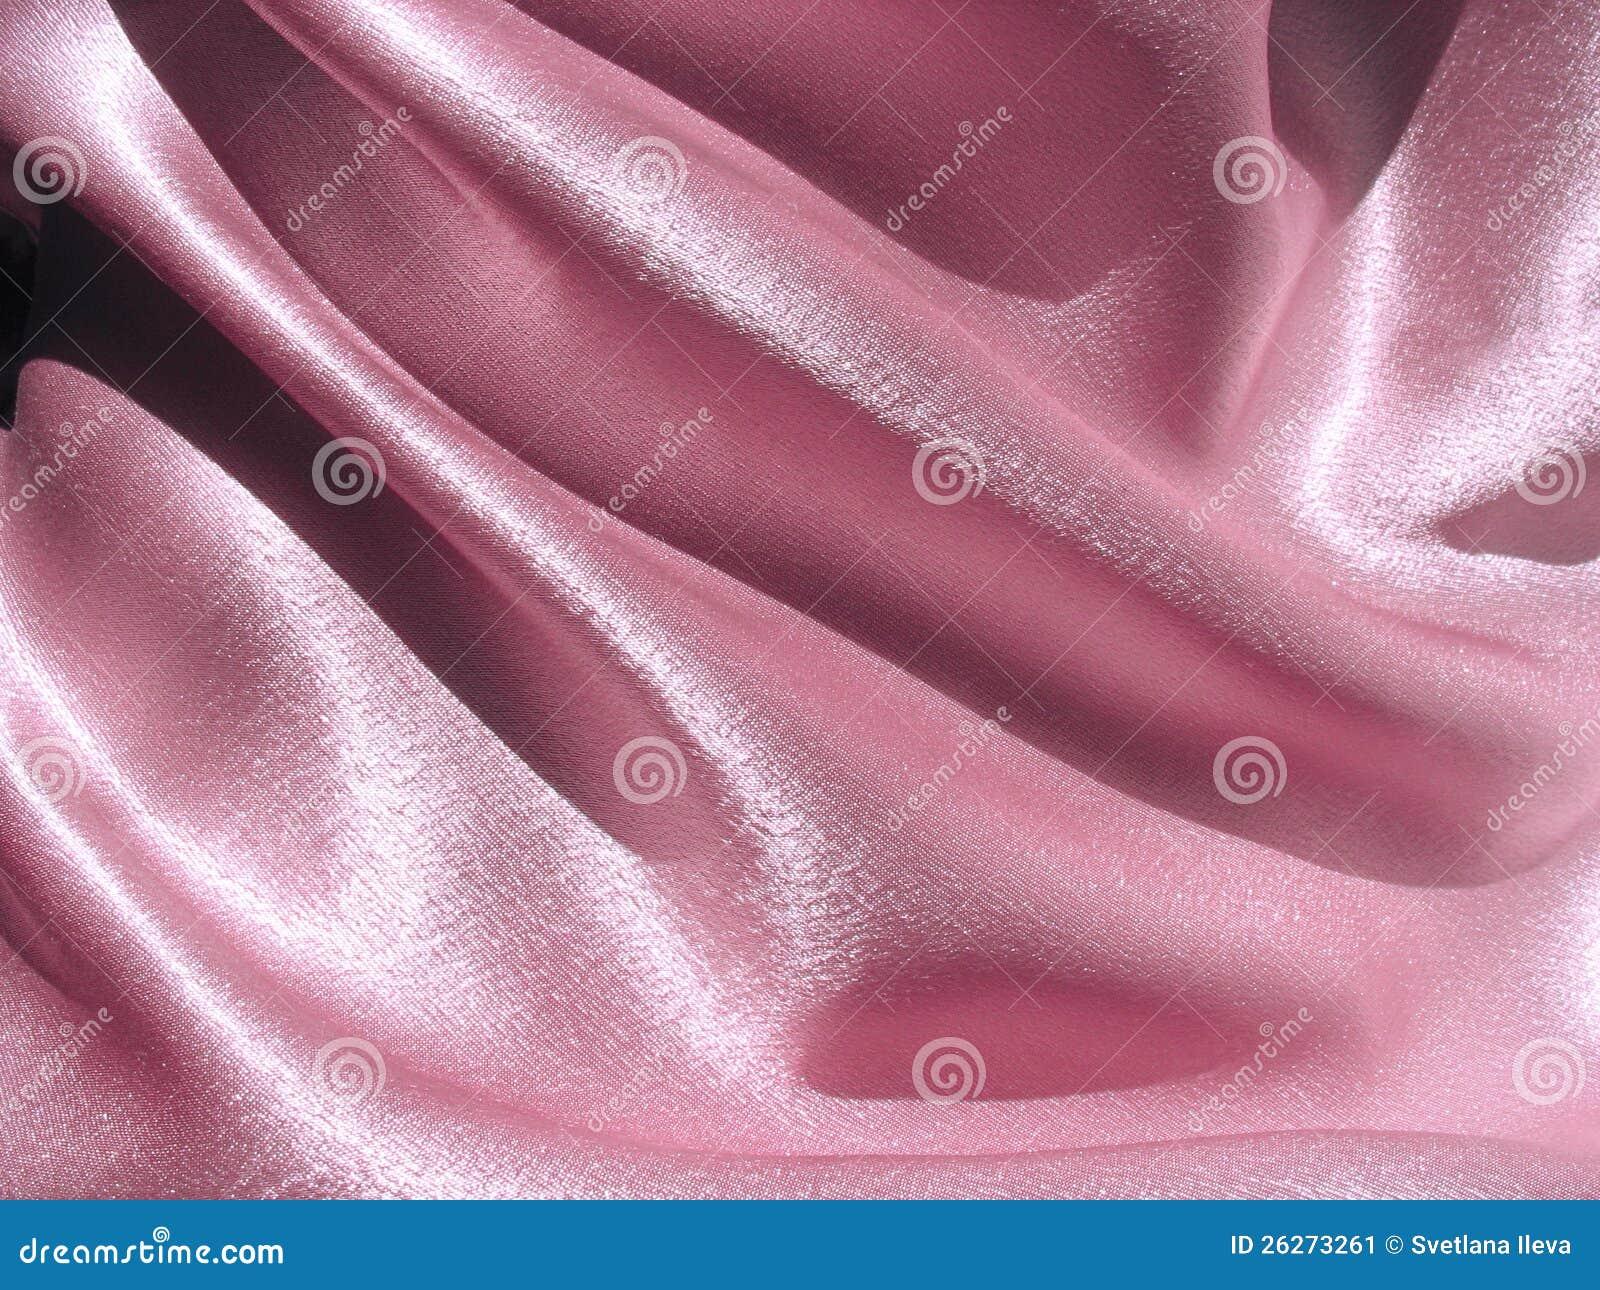 Draped pink satin backgroundPink Satin Background